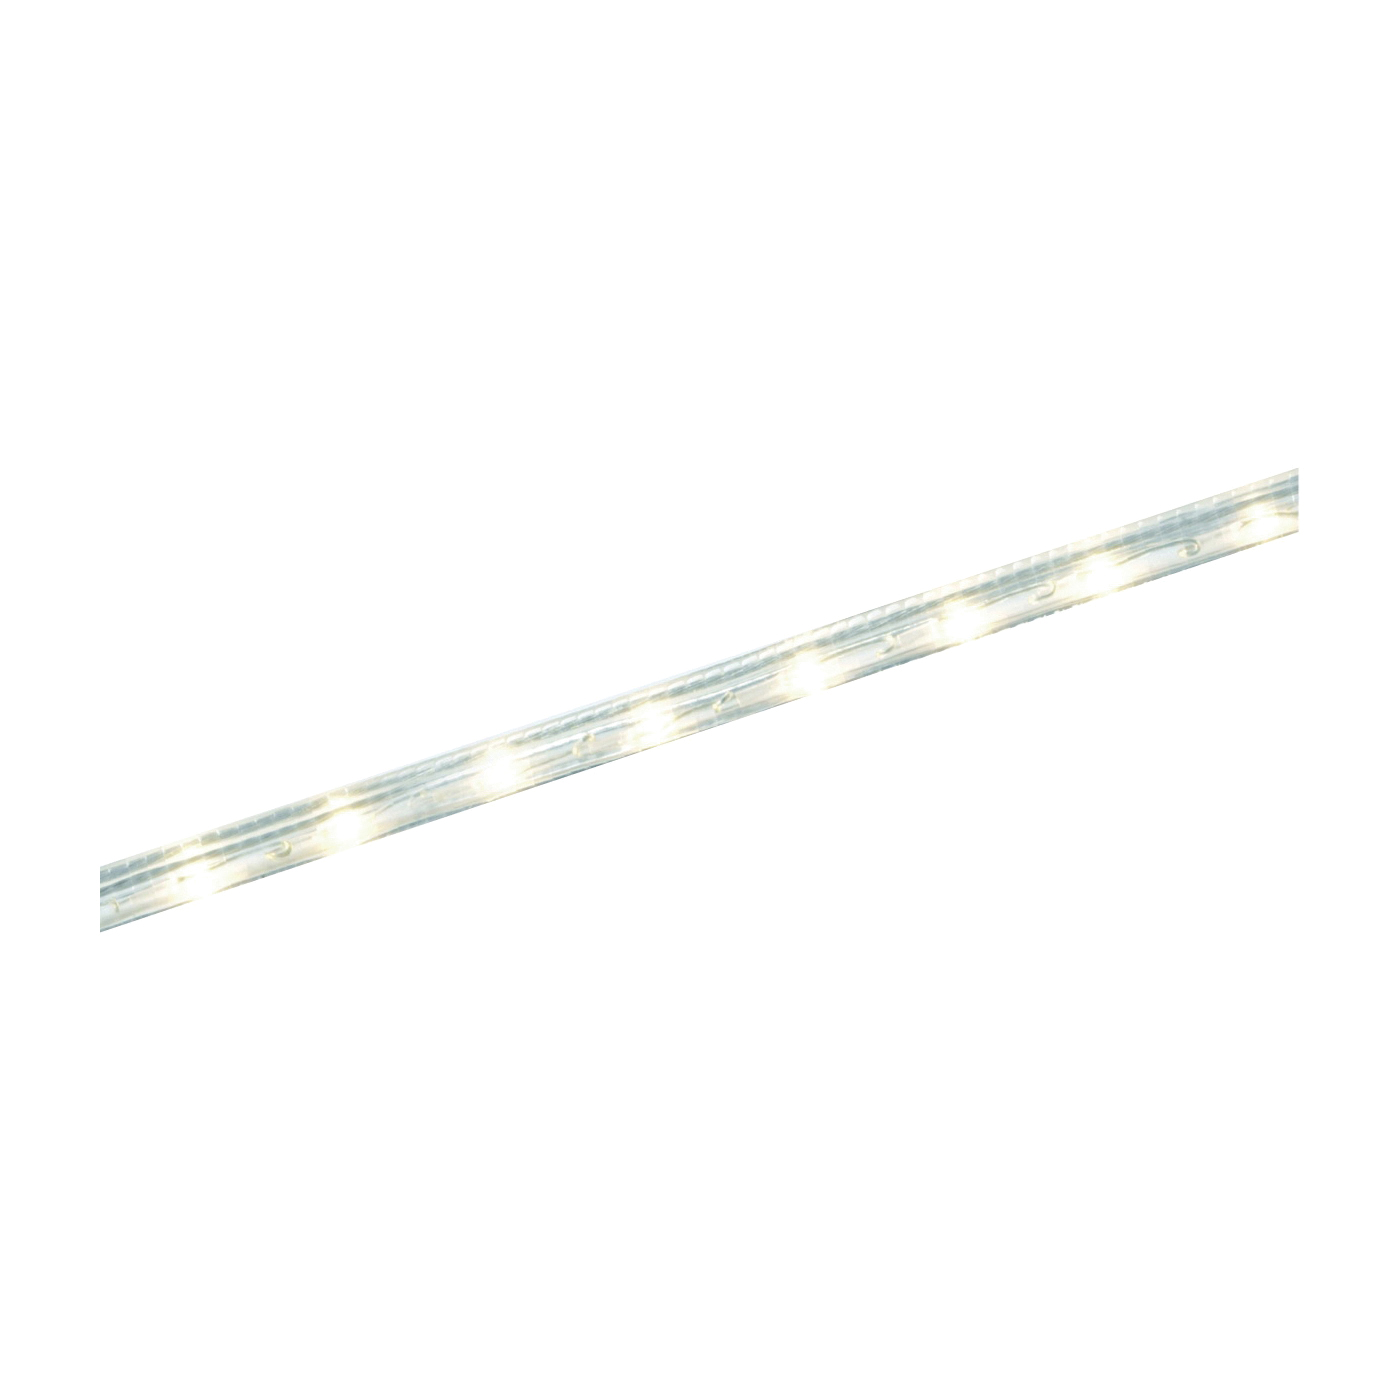 Picture of GOOD EARTH LIGHTING G9512-CLR-I Rope Light, 120 V, Incandescent Lamp, 2700 K Color Temp, 4000 hr Average Life